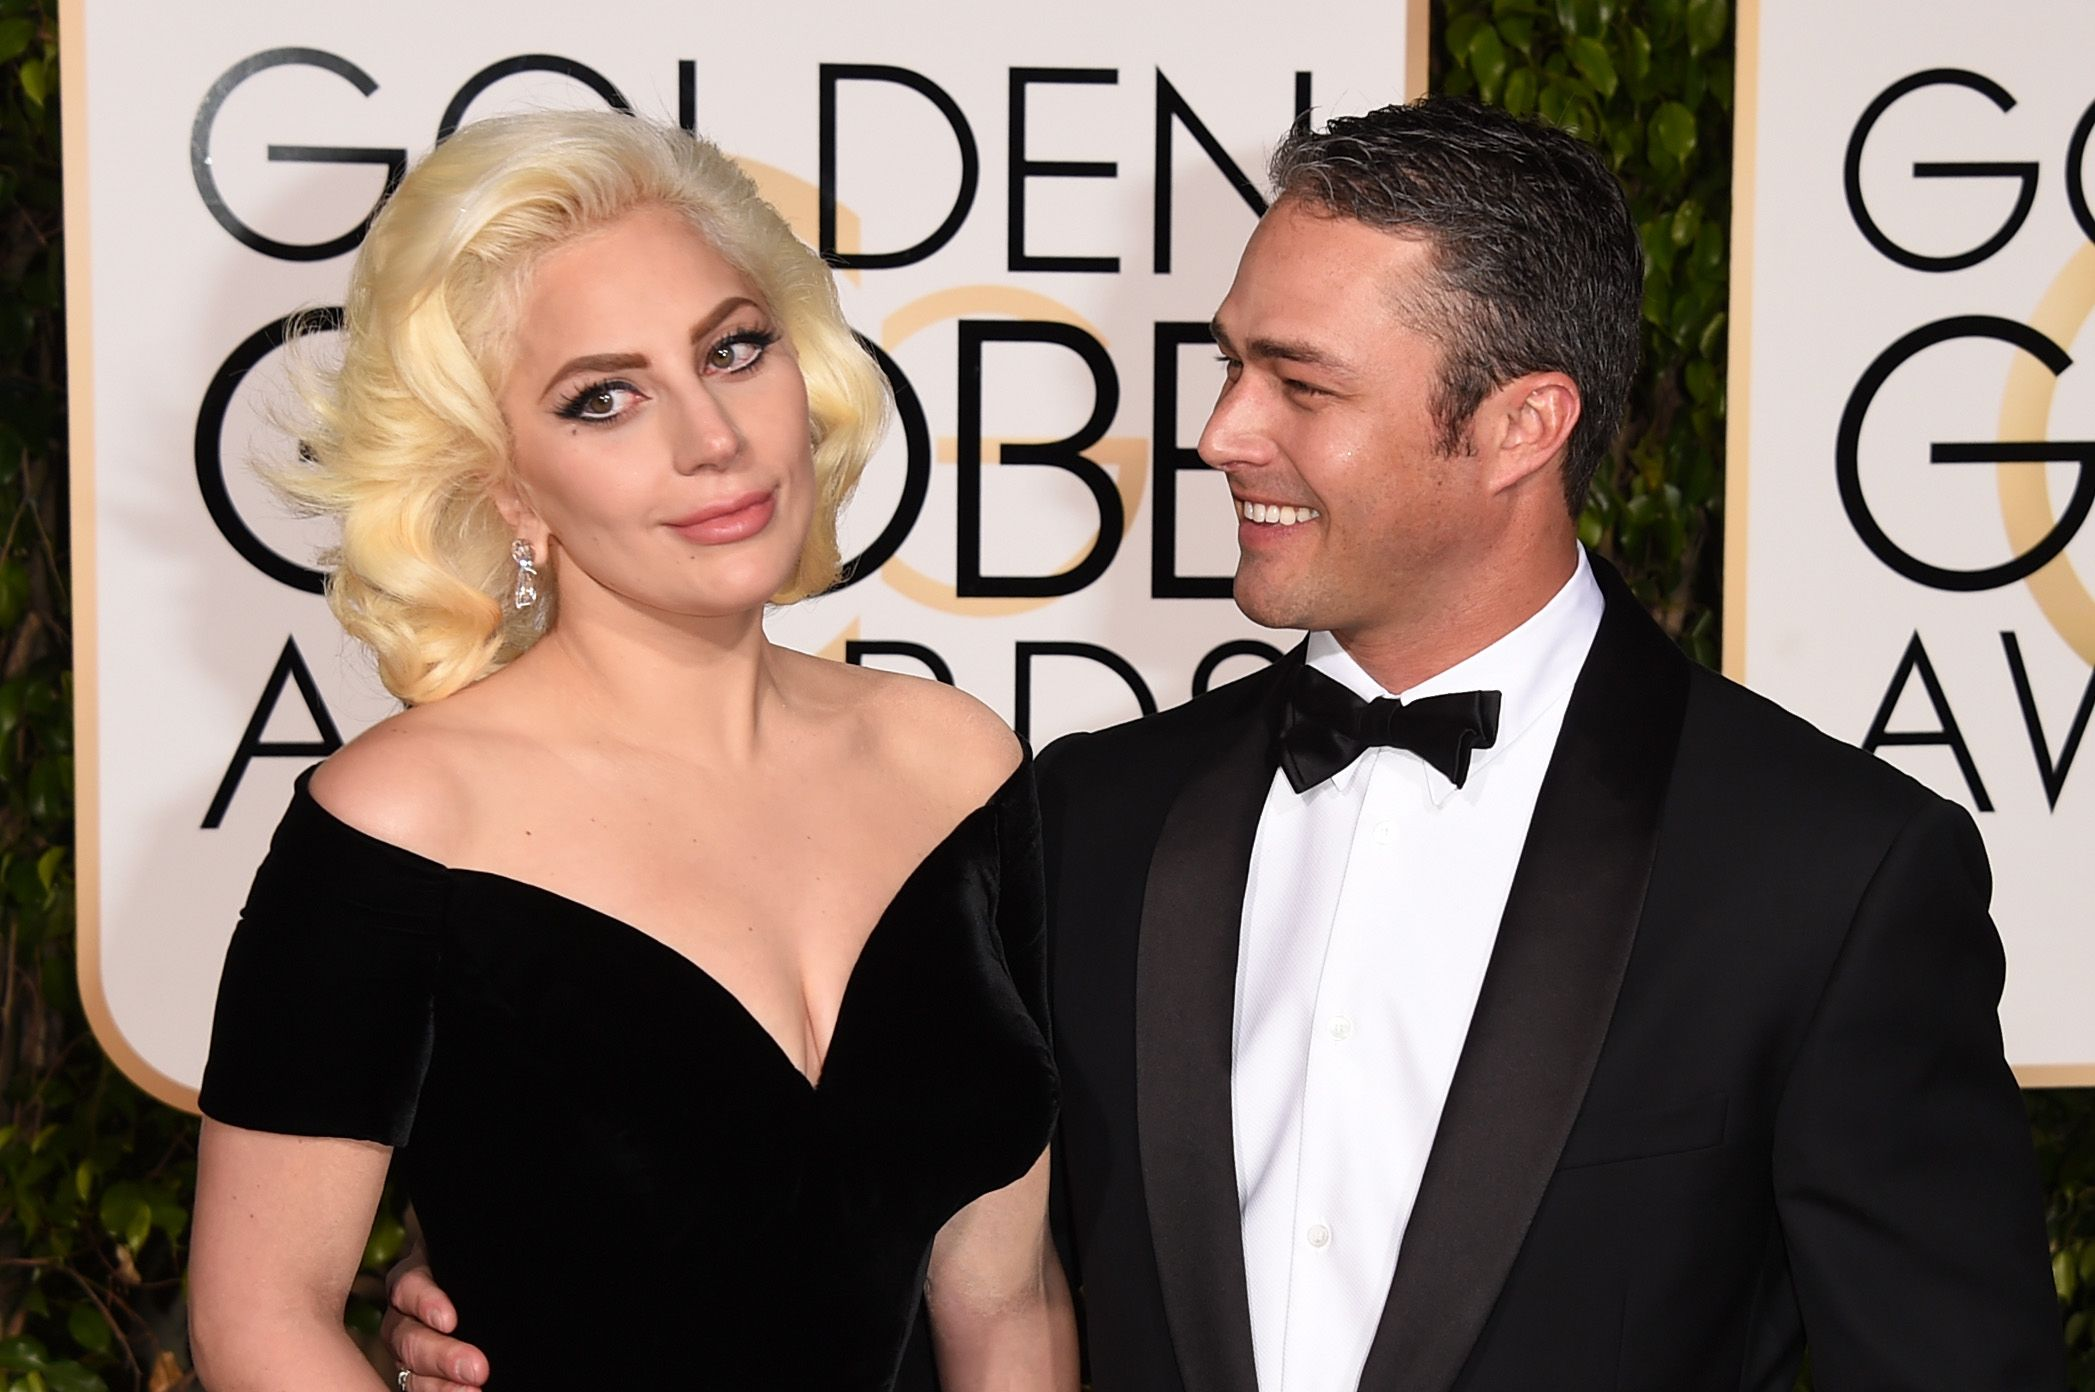 Lady Gaga e Taylor Kinney si lasciano?